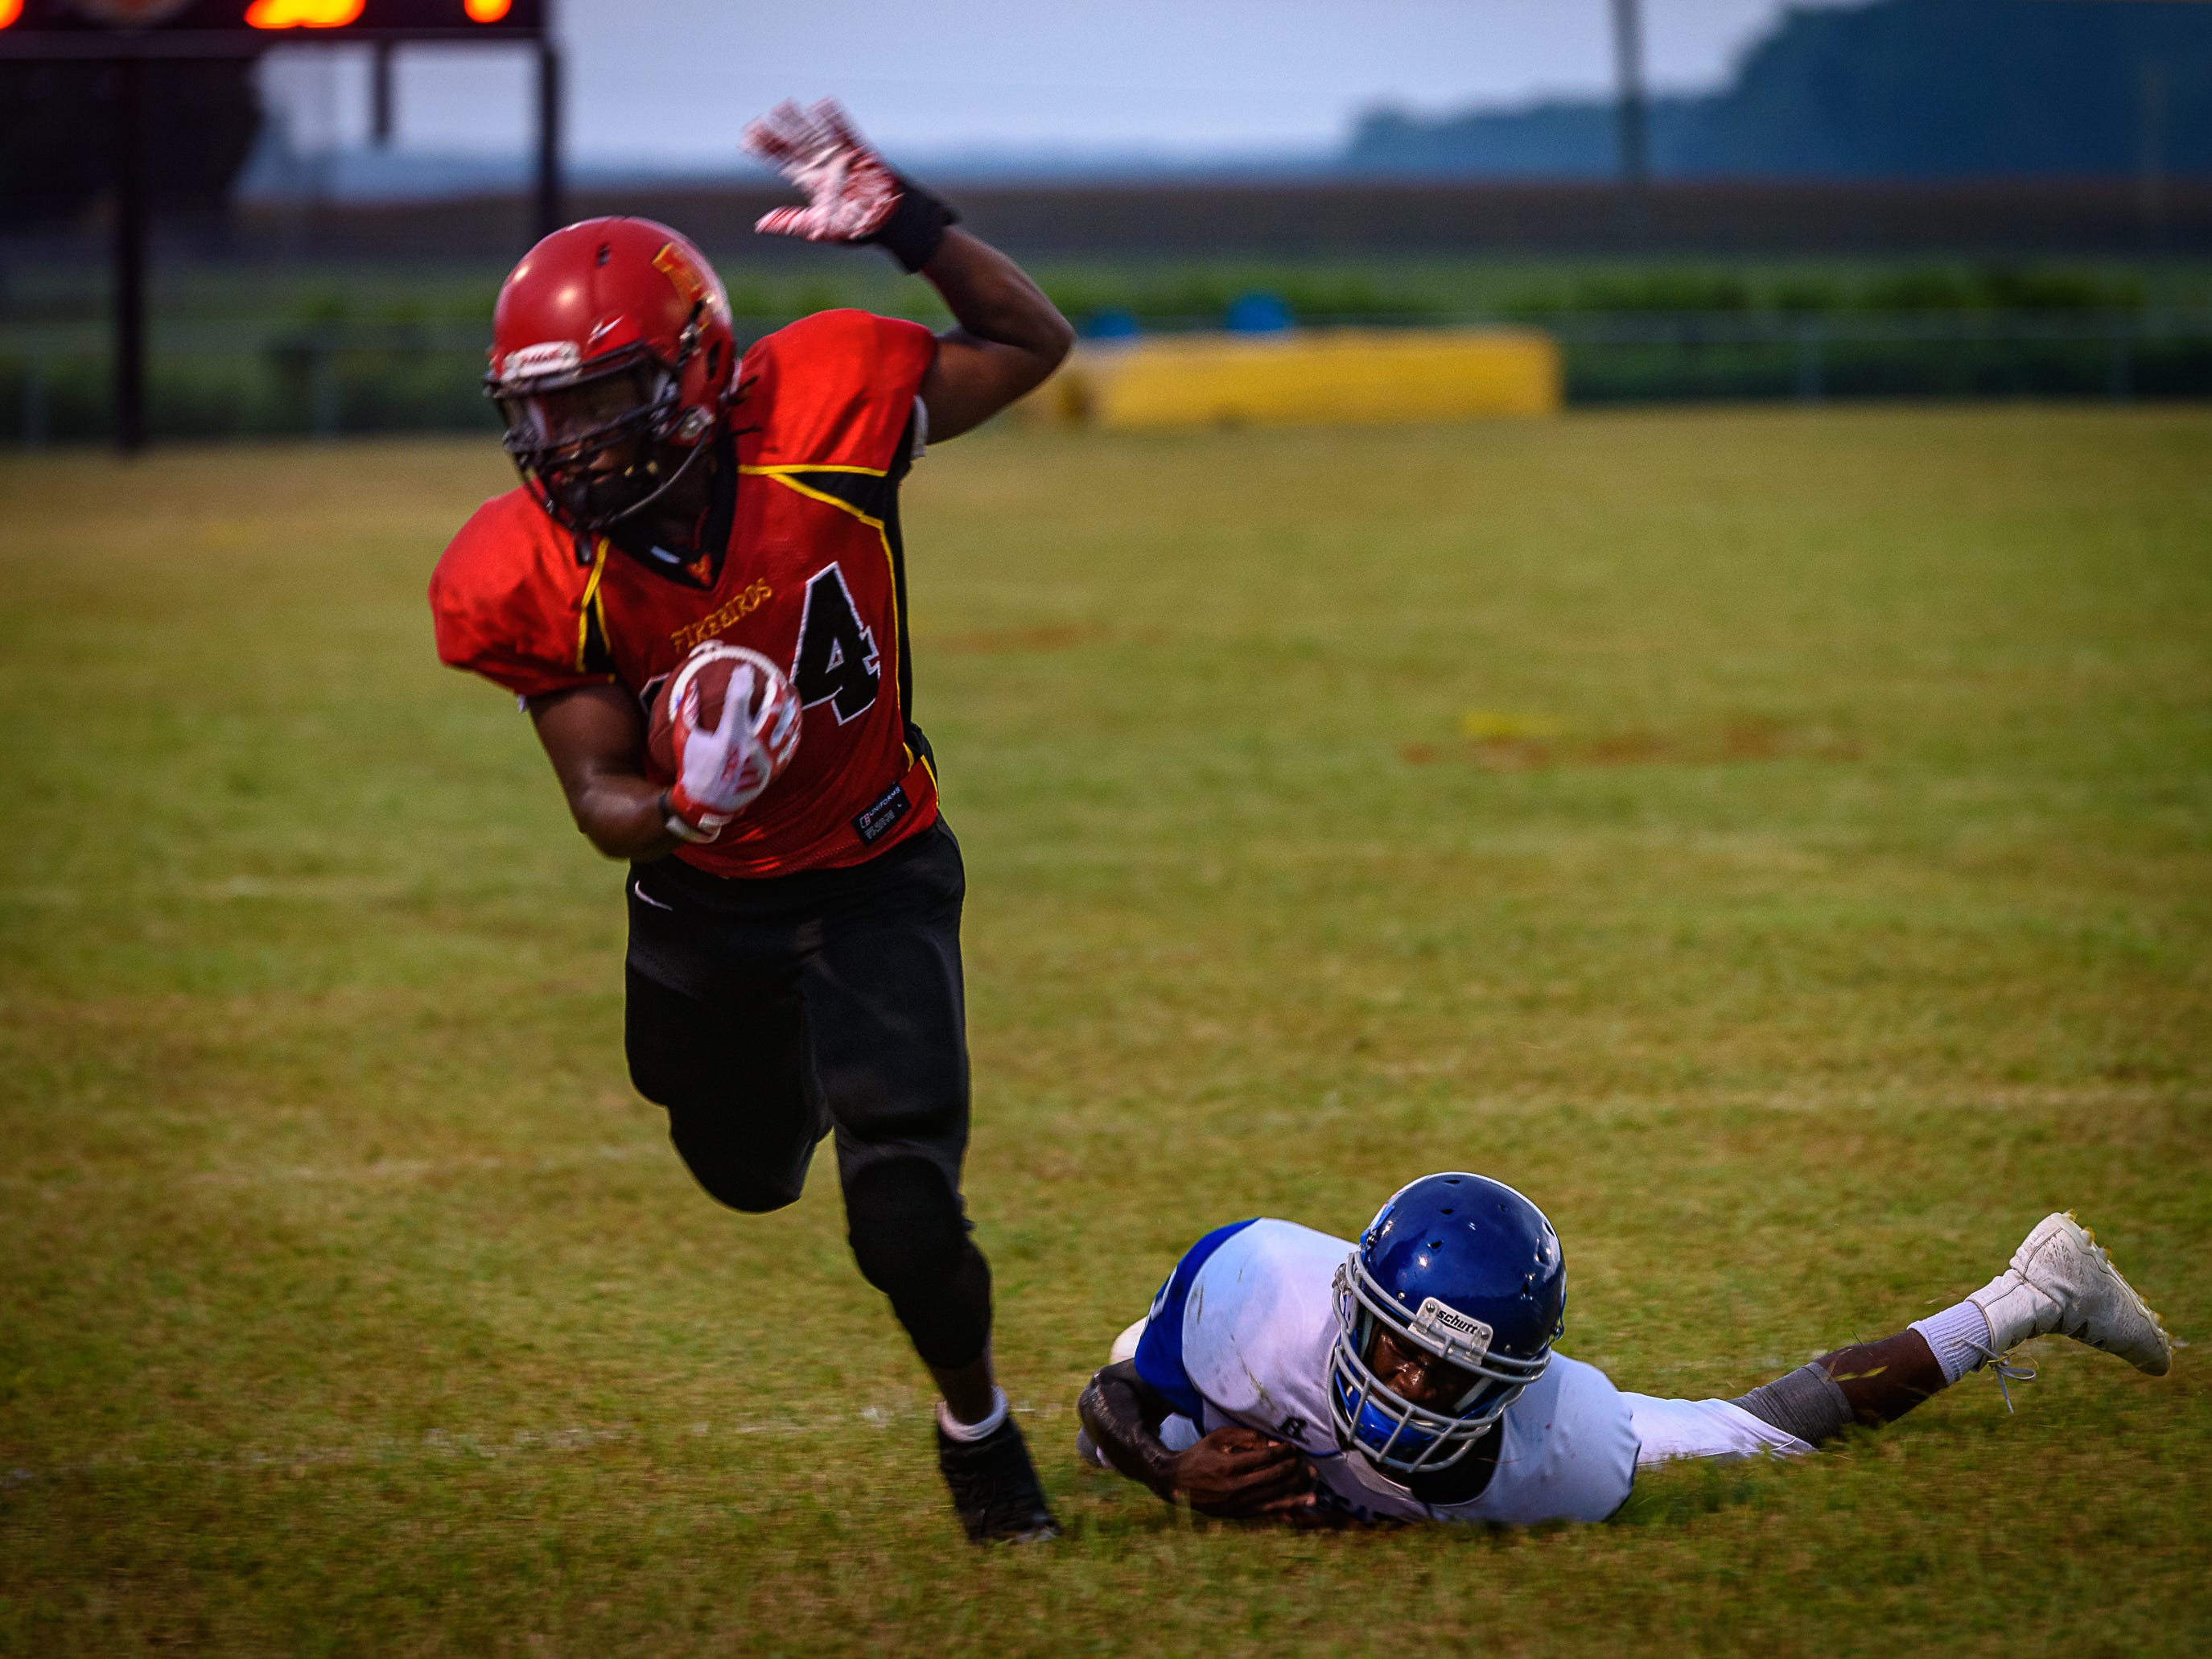 Arcadia's Bryden Bibbens breaks a tackle from Decatur's Shamar Briddell.